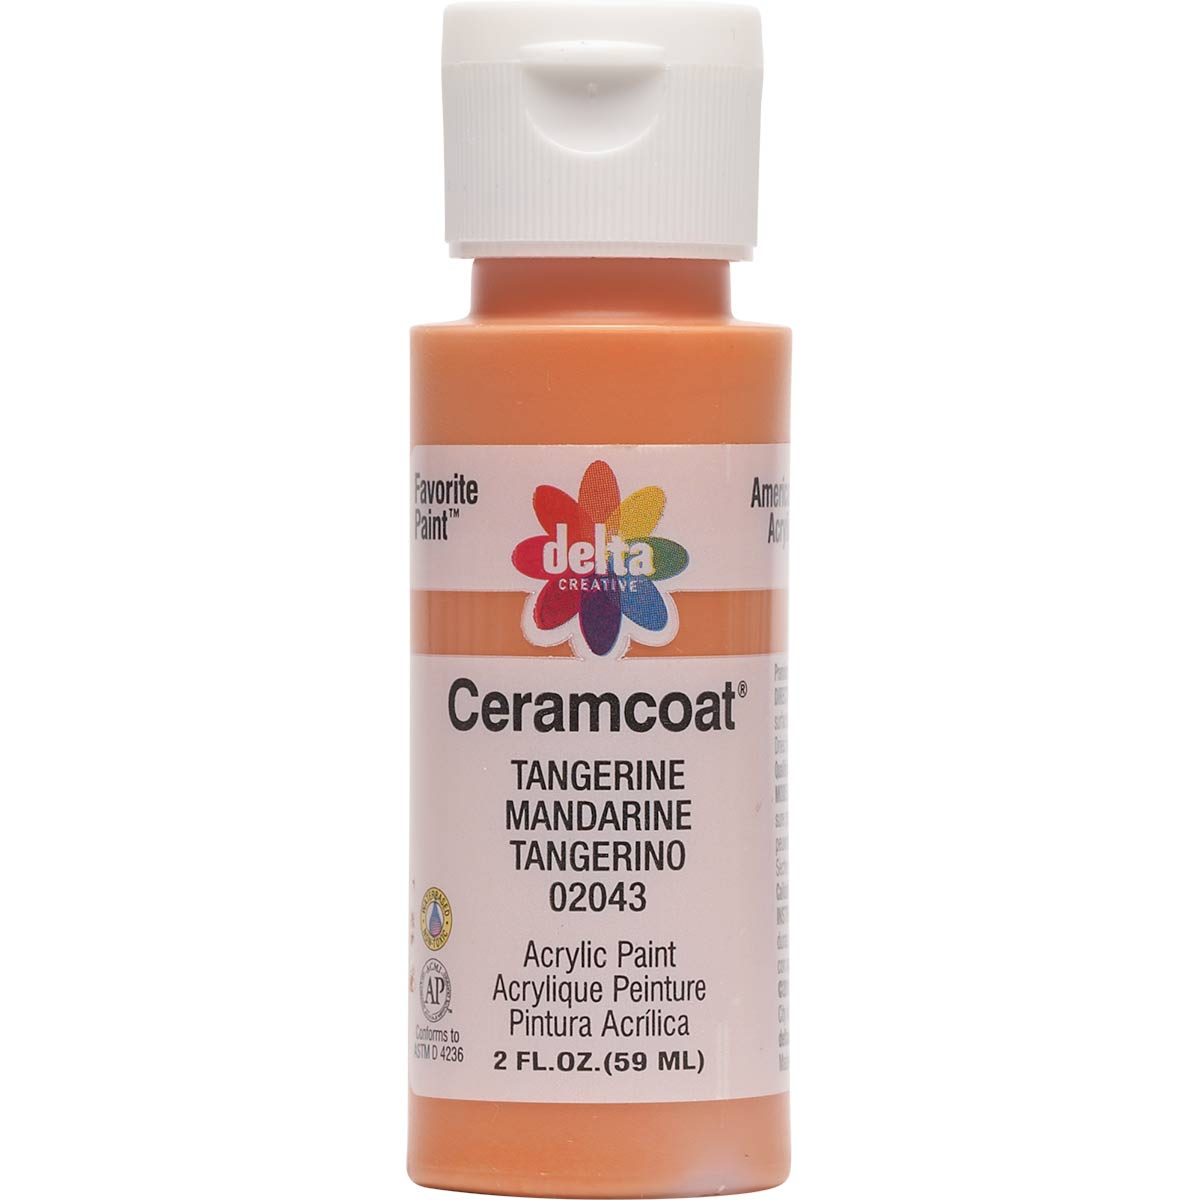 Delta Ceramcoat ® Acrylic Paint - Tangerine, 2 oz. - 020430202W